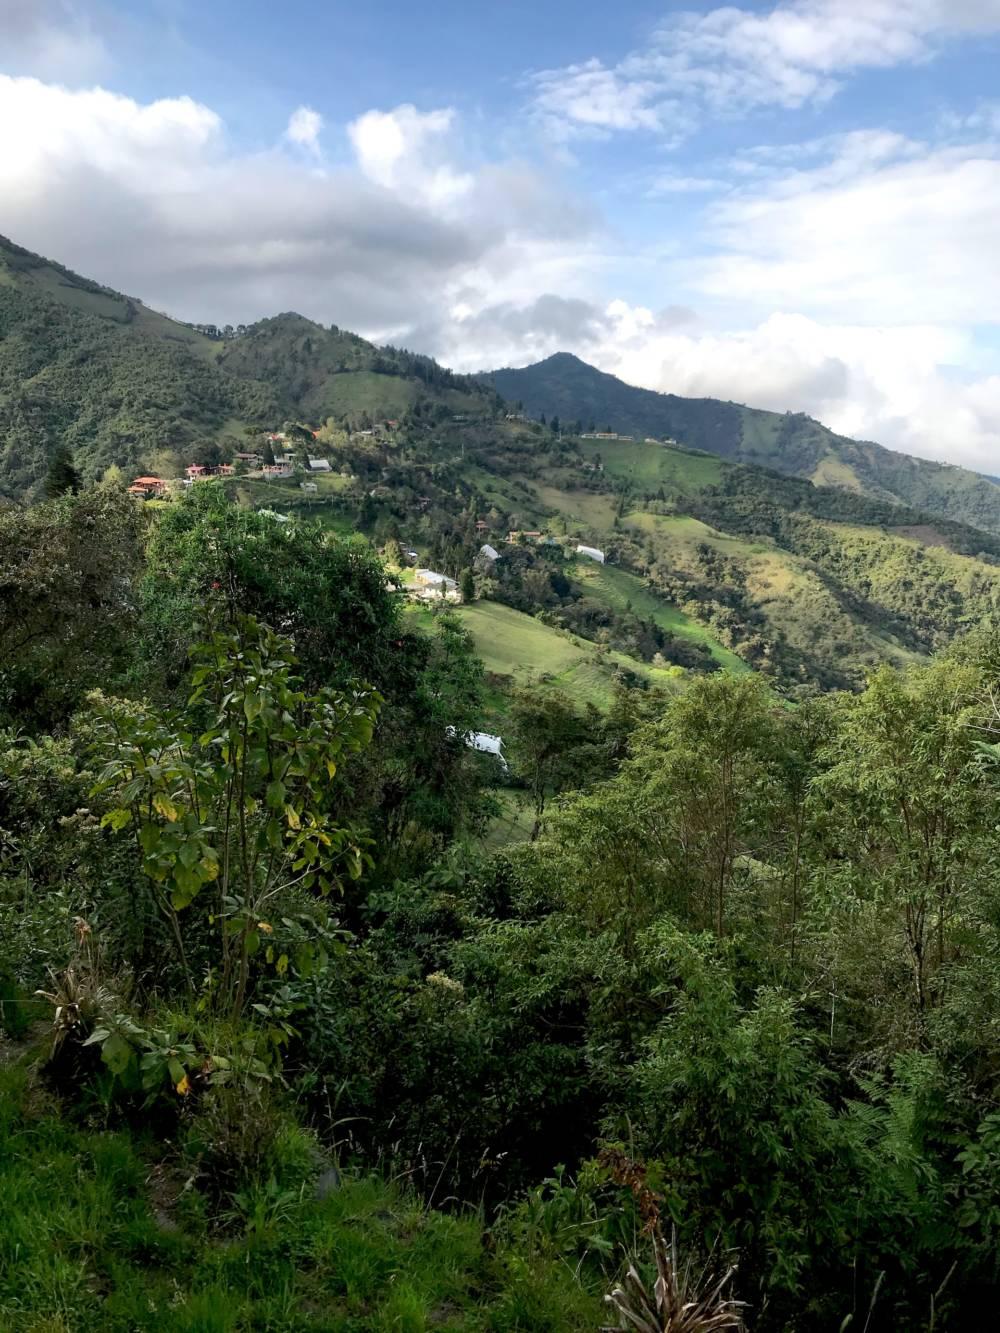 Überall in Quitos Umgebung gibt es indigene Völker